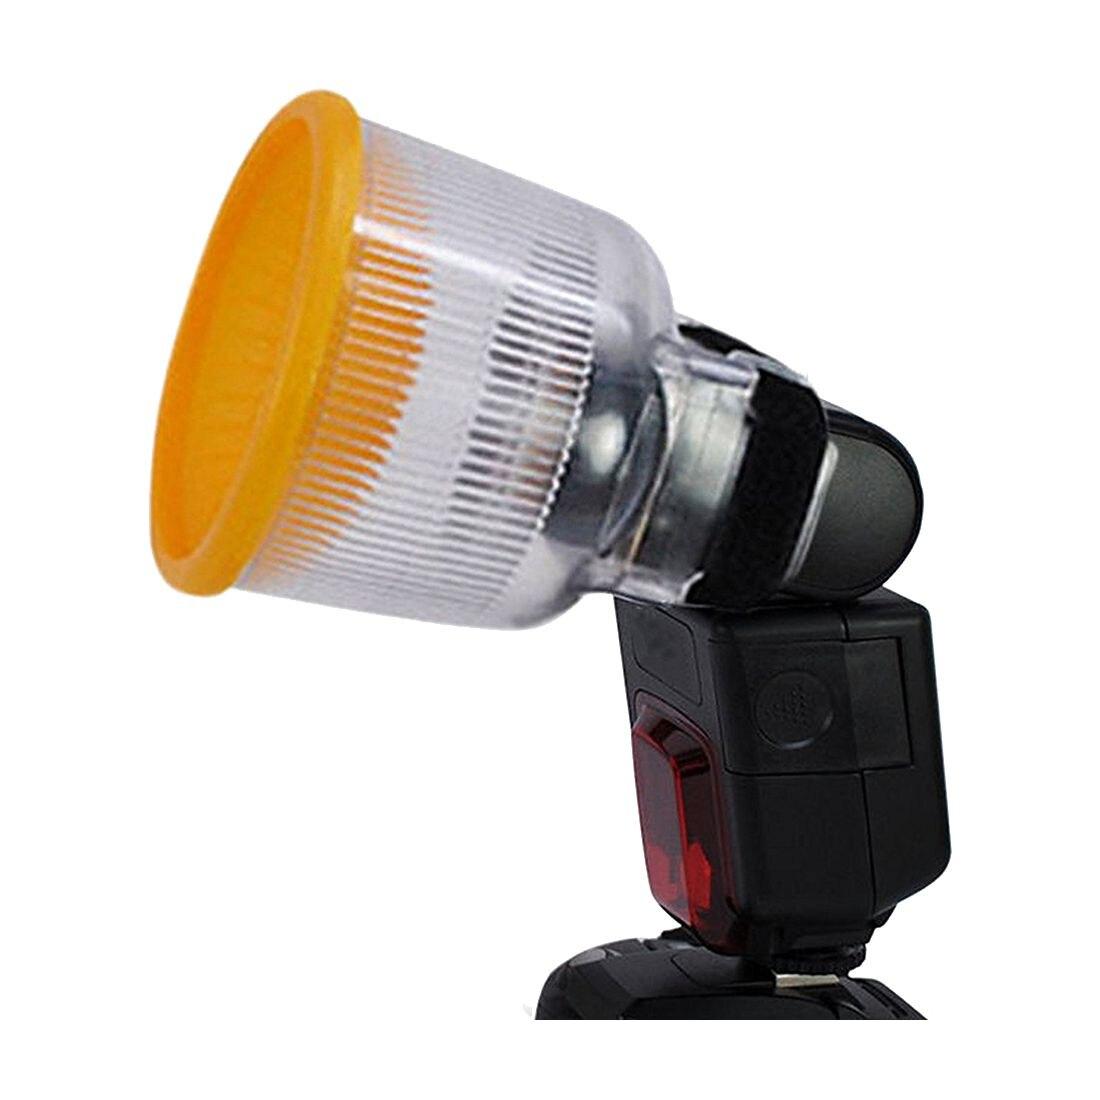 Difusor de Flash para Canon 420EX 430EX 550EX 580EX 580EX II 600EX Nikon SB600 SB700 SB800 SB900 SB910 para Sony HVL-F42AM HVL-F43AM